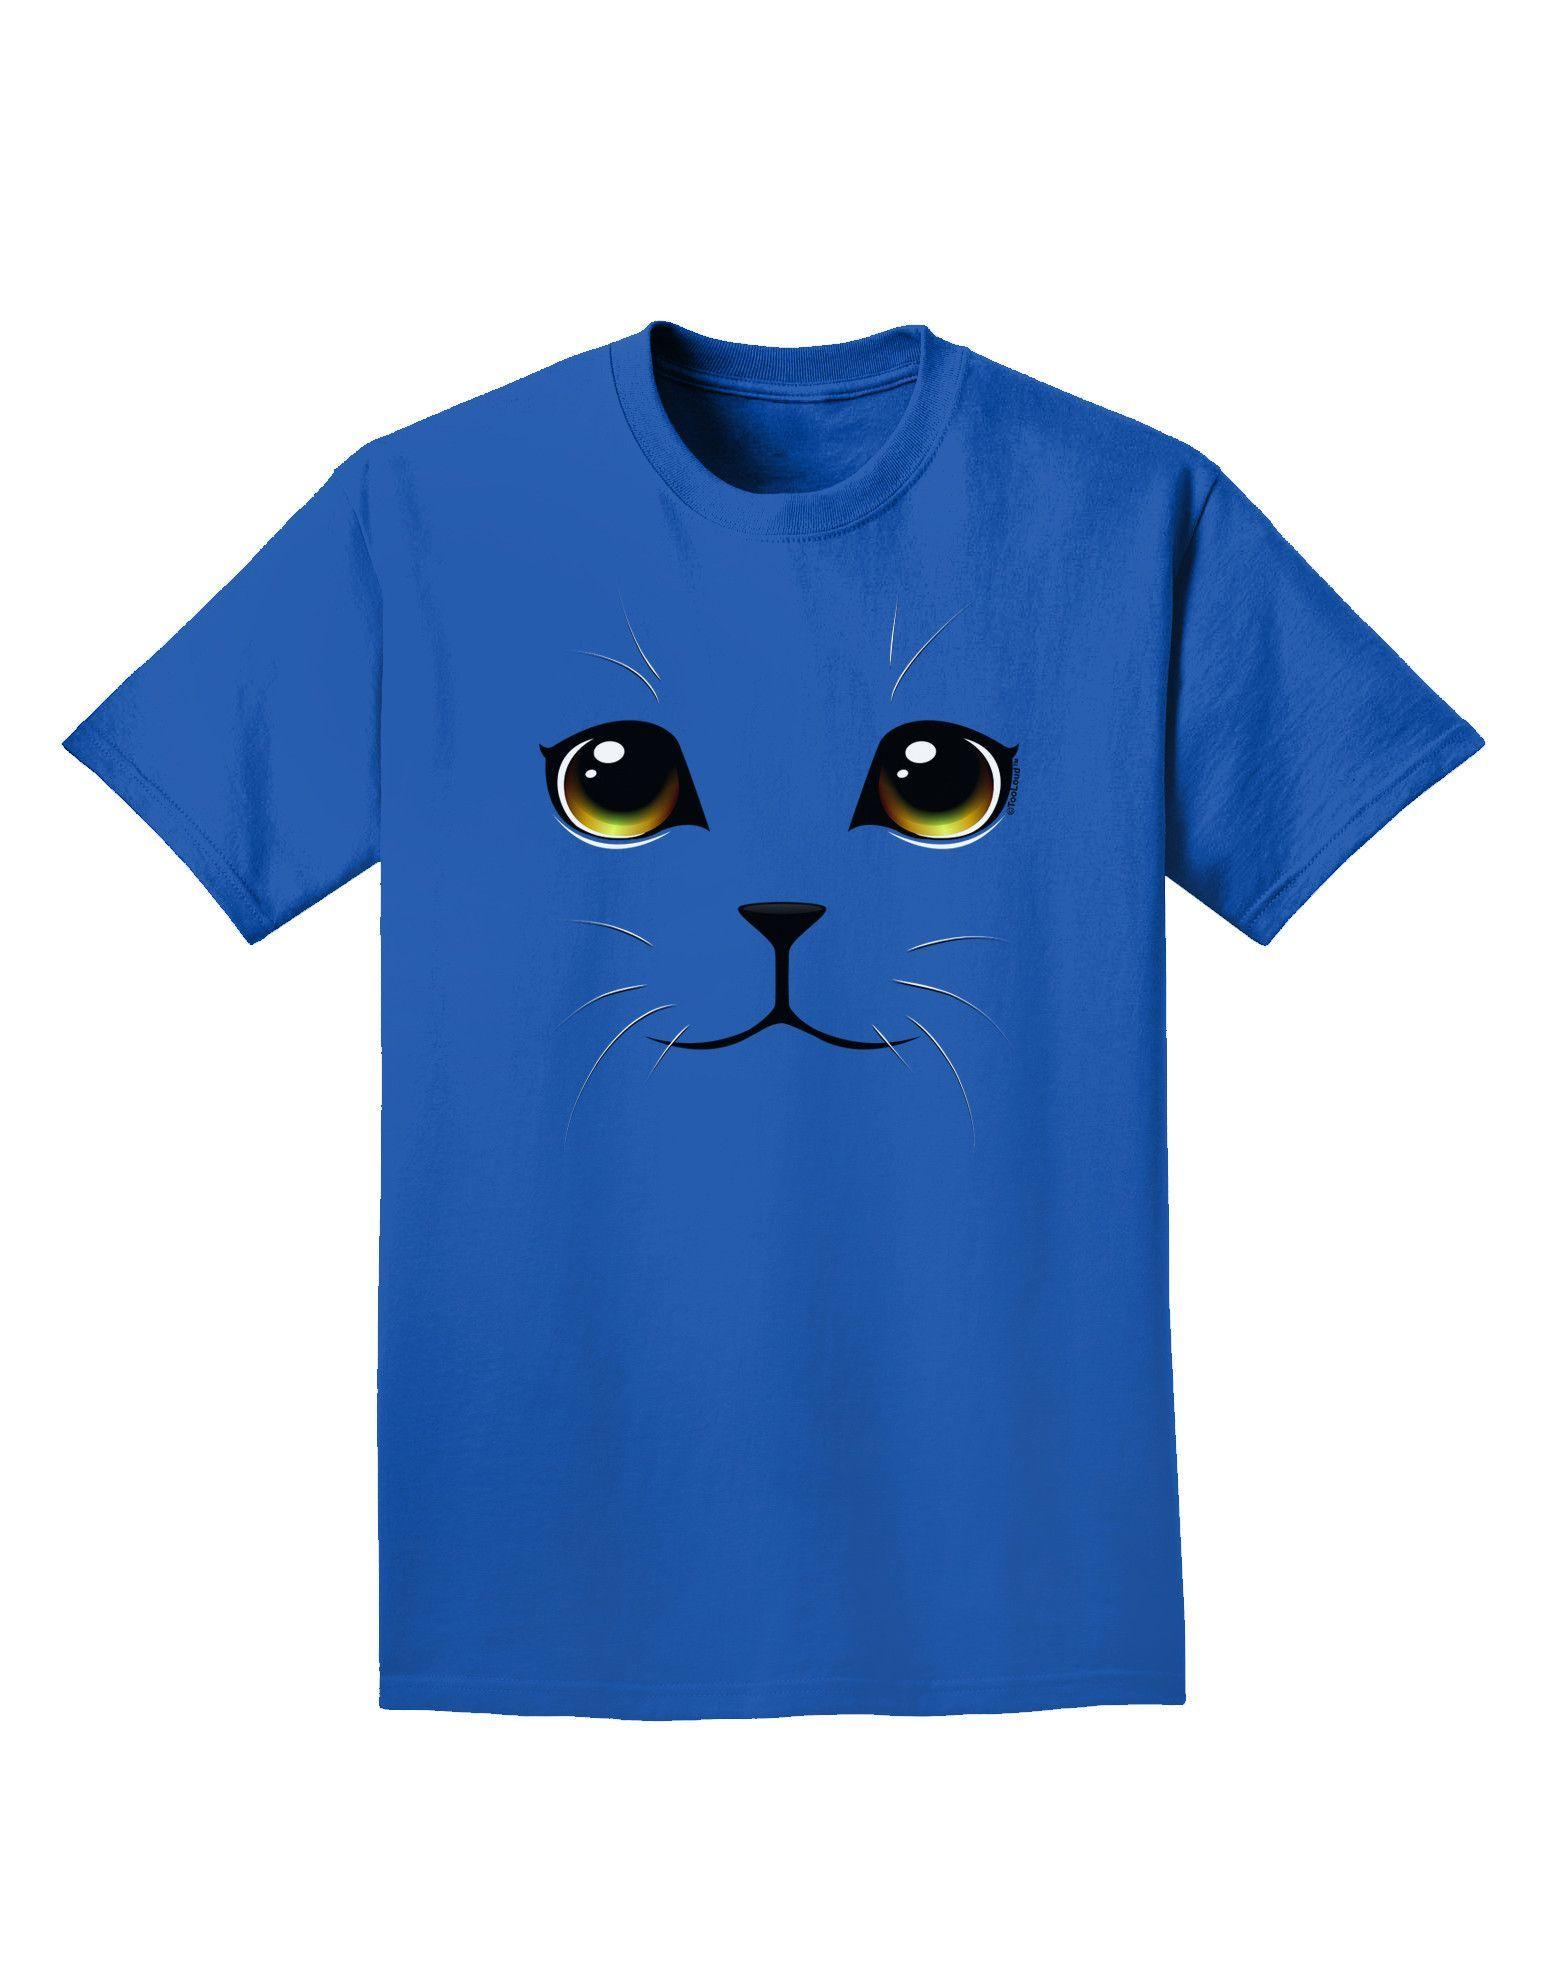 TooLoud Yellow Amber-Eyed Cute Cat Face Adult Dark T-Shirt